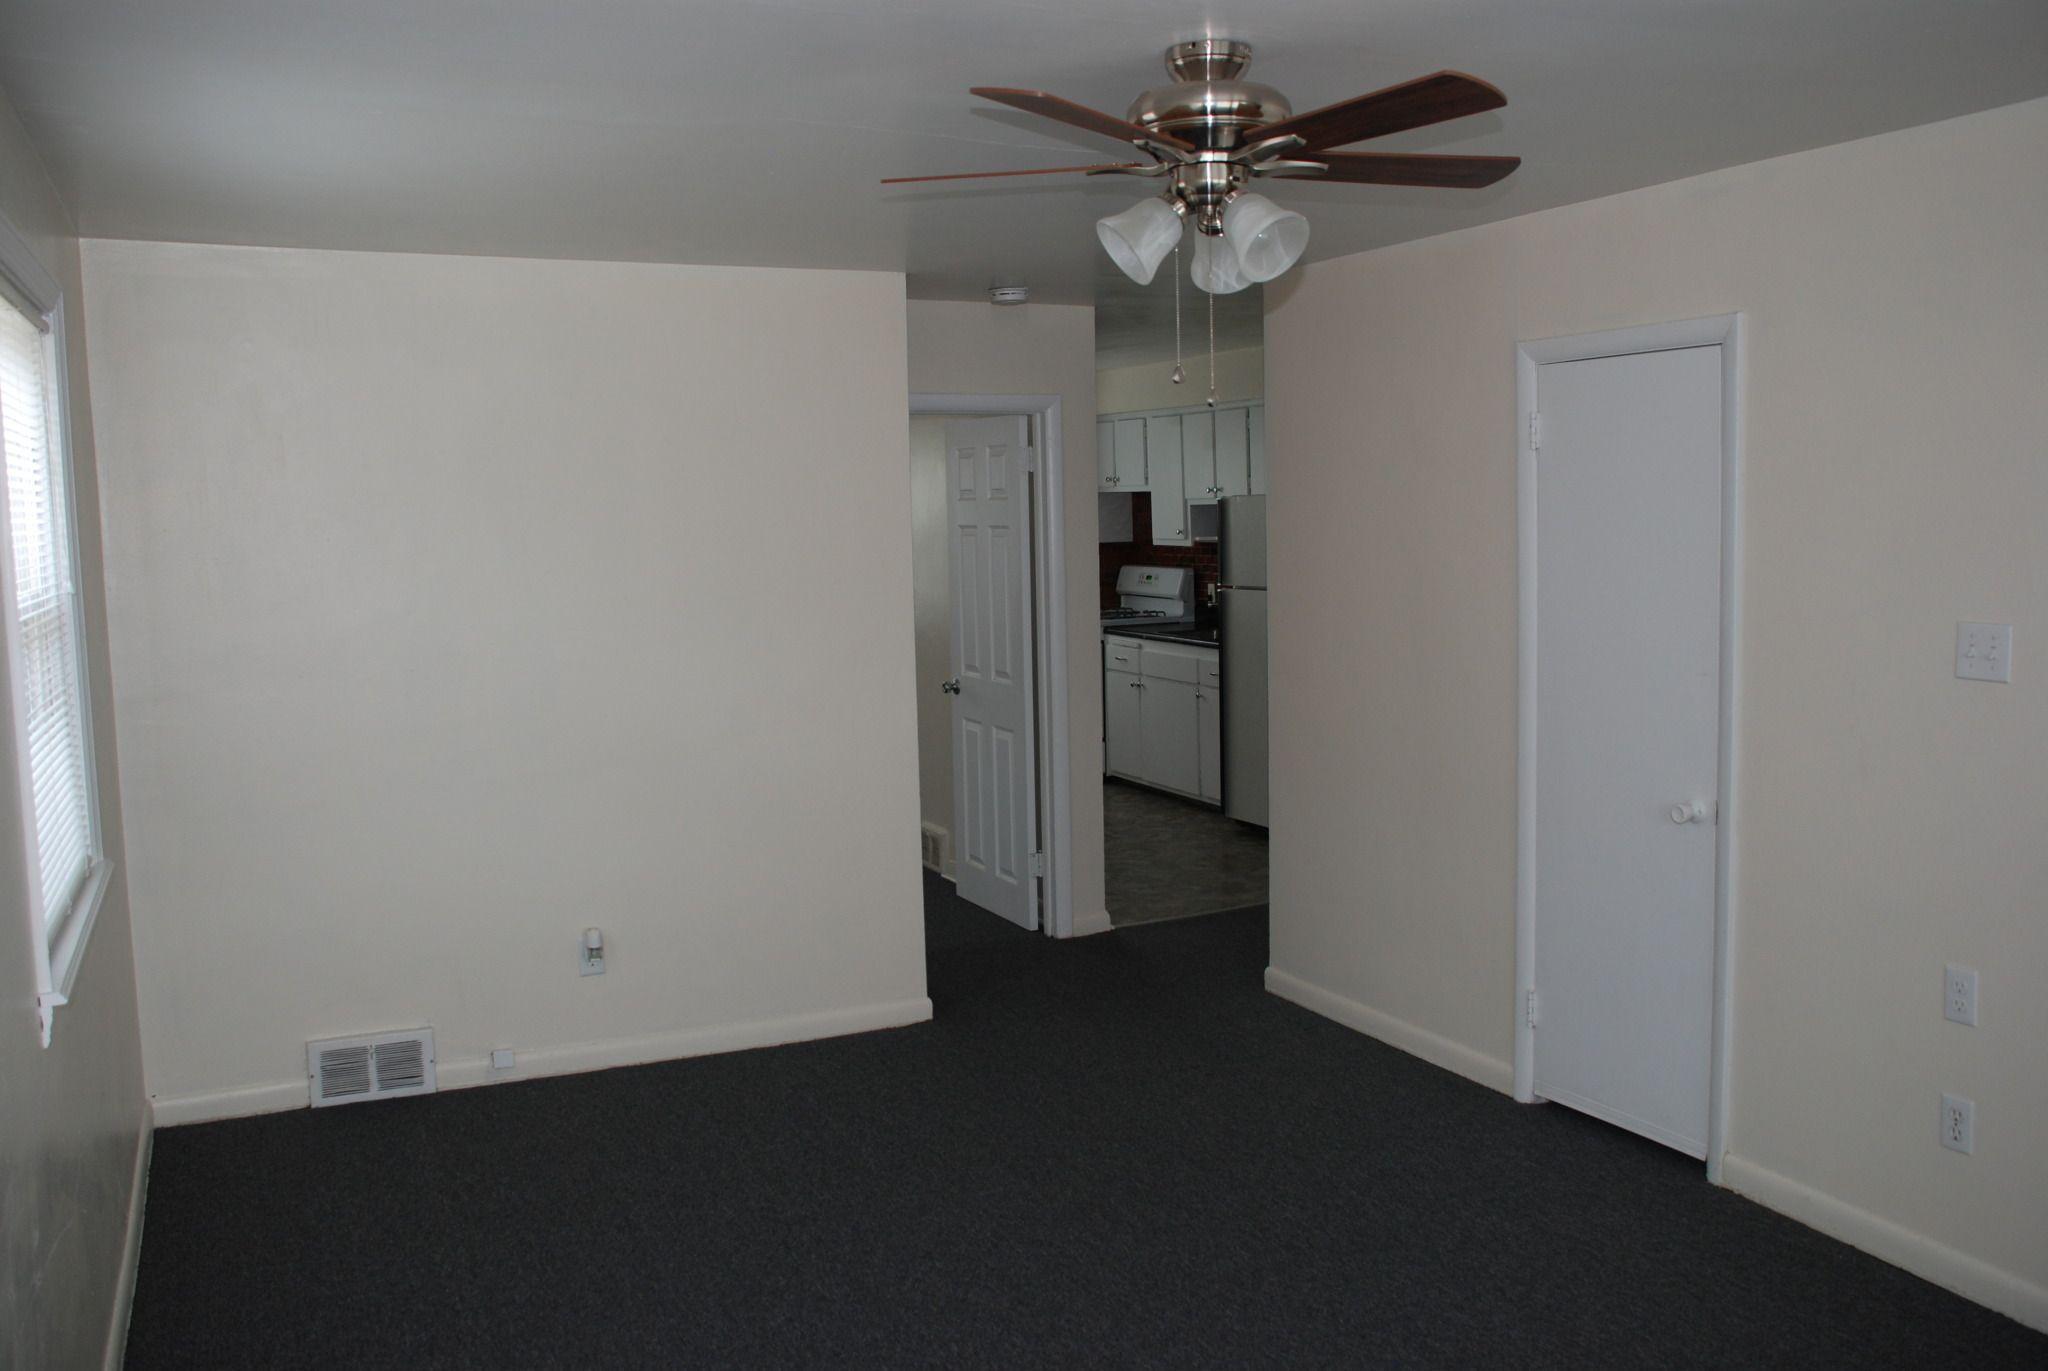 129 Bridge Interior Family Room 2 (2)